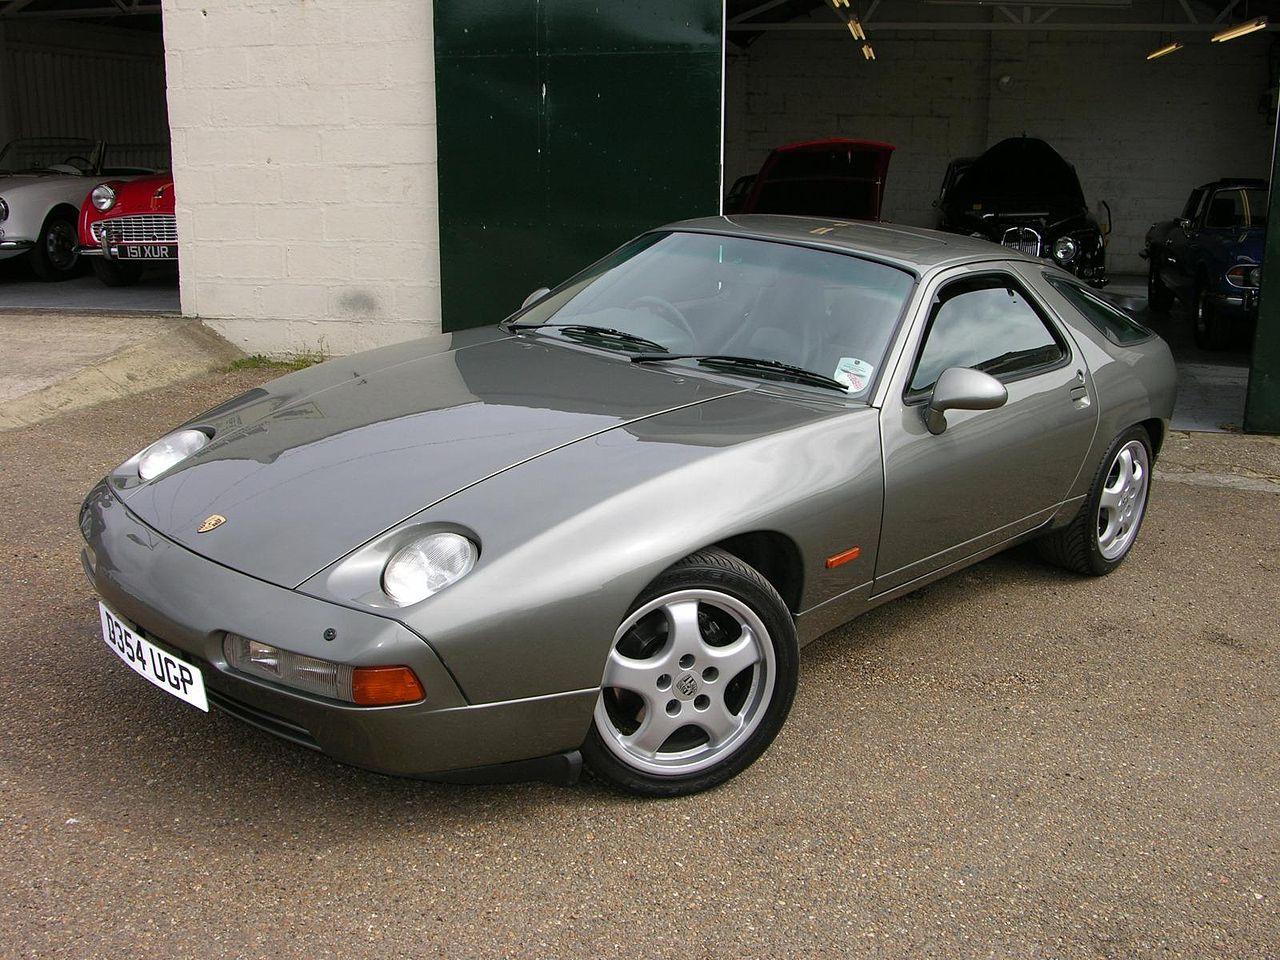 1280px-1987_Porsche_928_S4_front